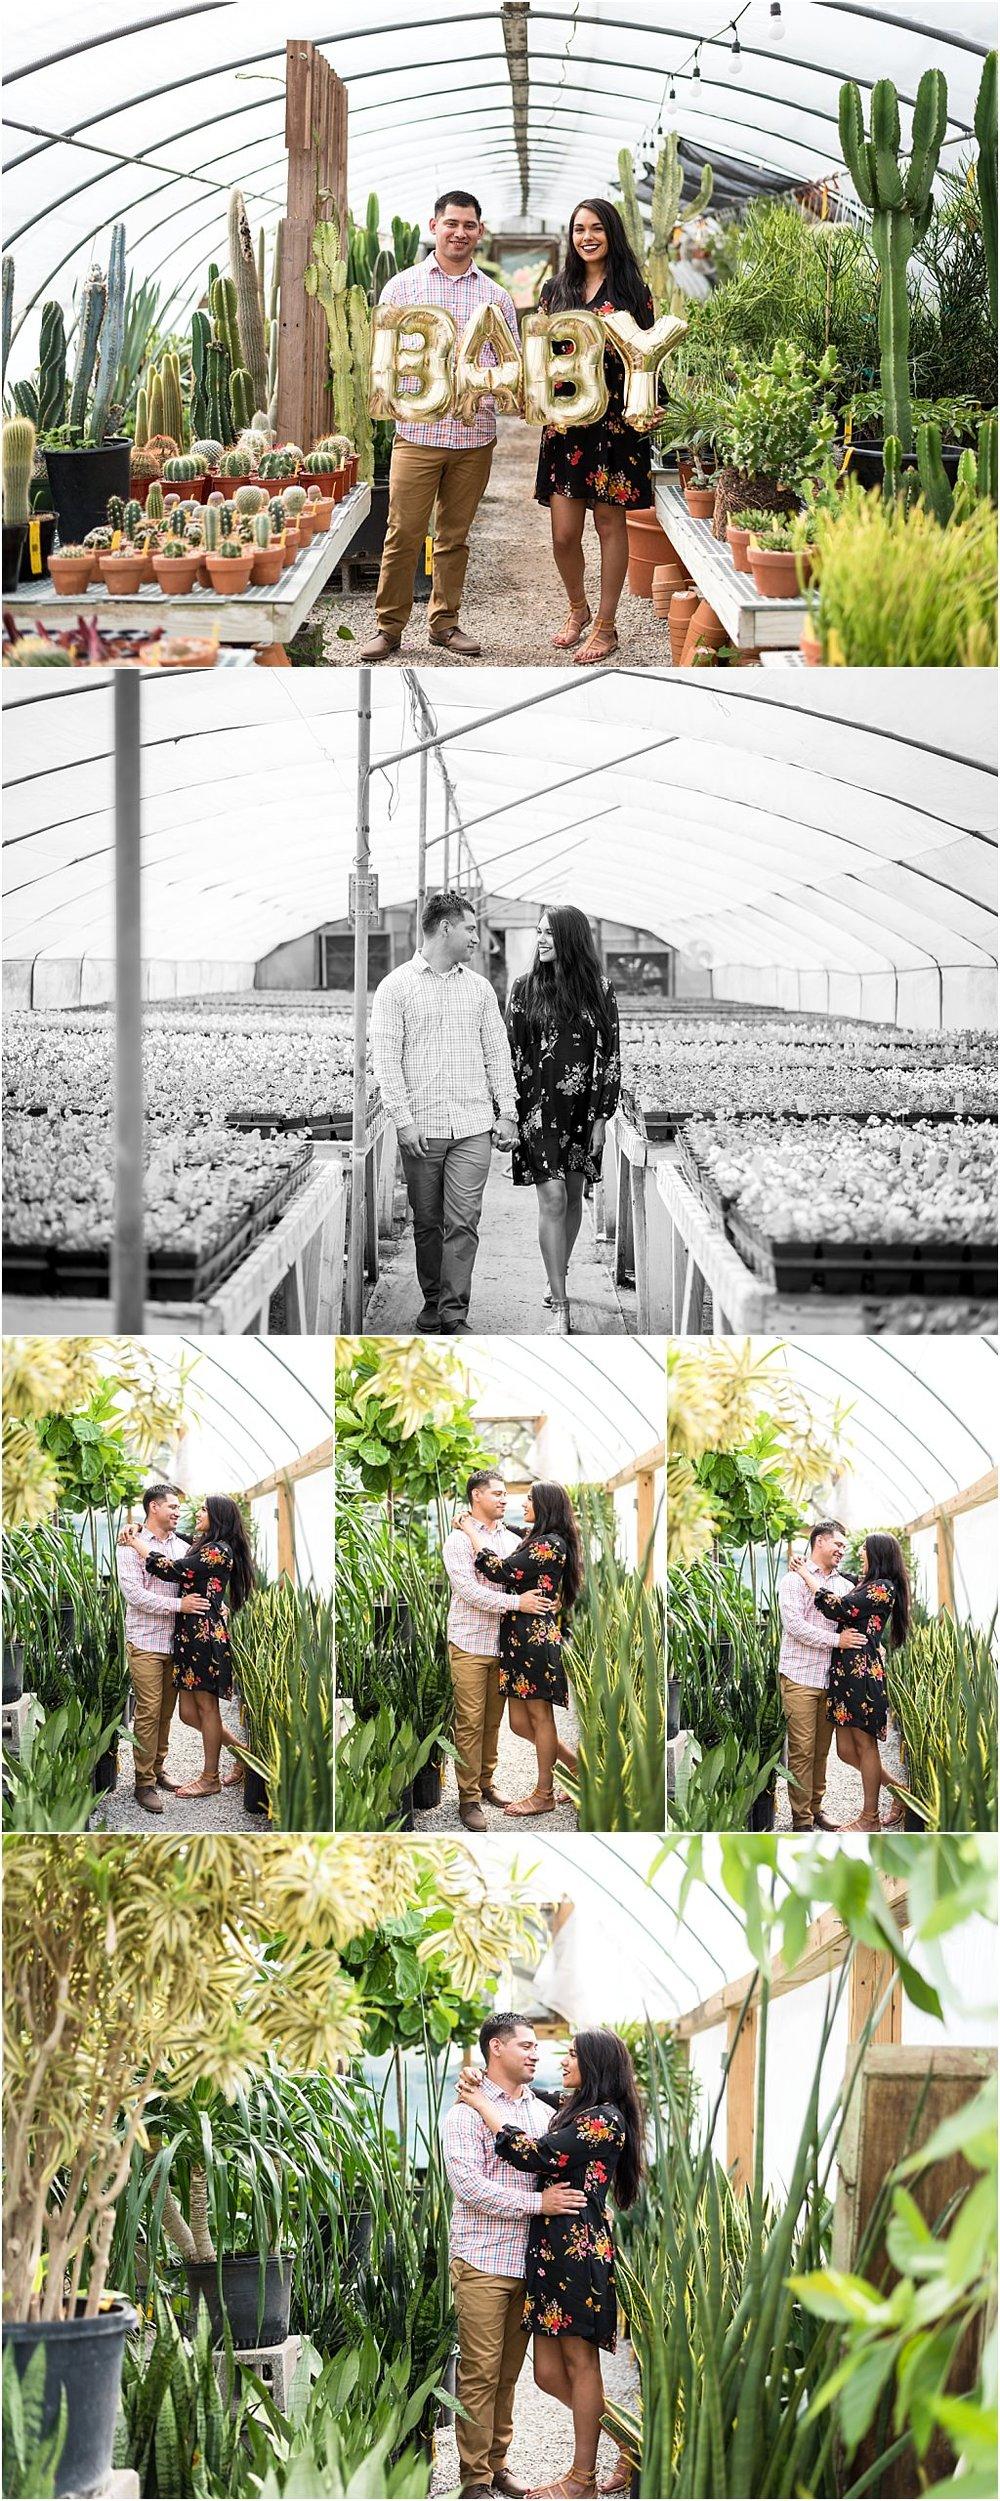 Hewitt-Garden-Center-Green-House-Phoography-Session-Pregnancy-Announcement-Nashville-Lifestyle-Photographer+5